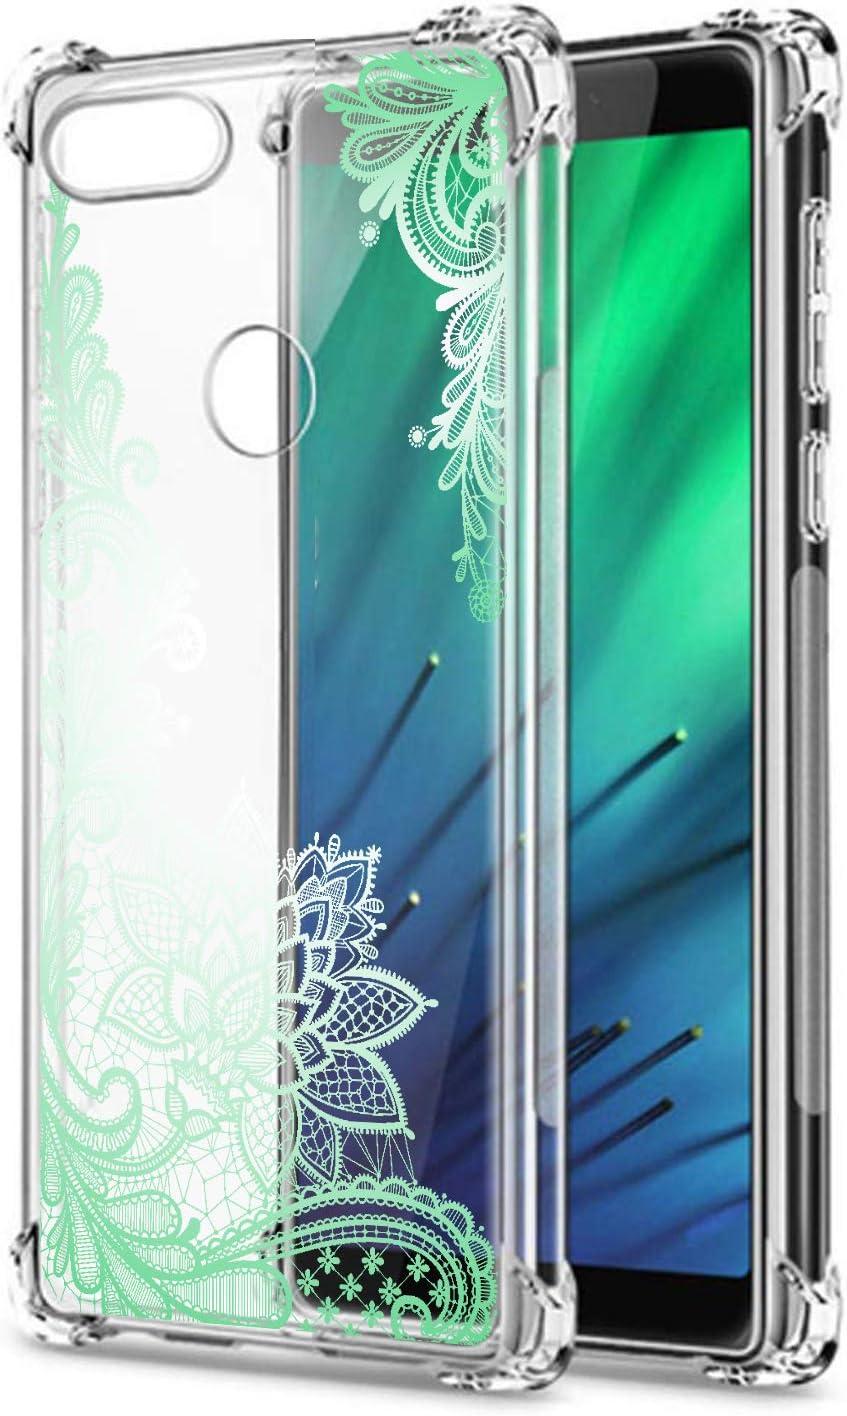 Oihxse Cristal Compatible con Samsung Galaxy J330/J3 Pro Funda Transparente TPU Silicona Estuche Airbag Esquinas Anti-Choque Anti Rasguños Diseño Rosa Flower Caso (Flores B10)